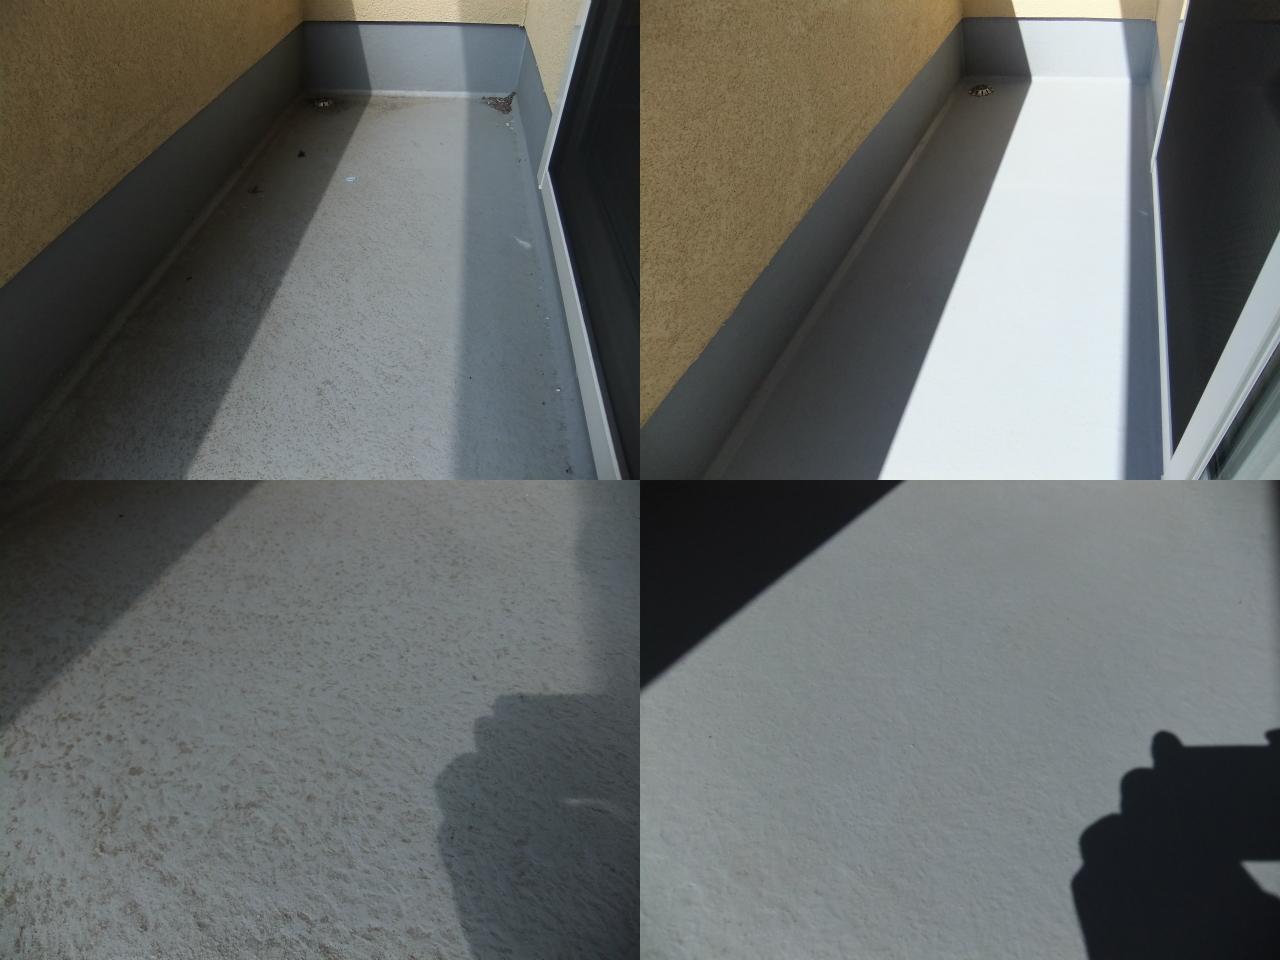 http://ajras.net/images/120803-veranda.jpg